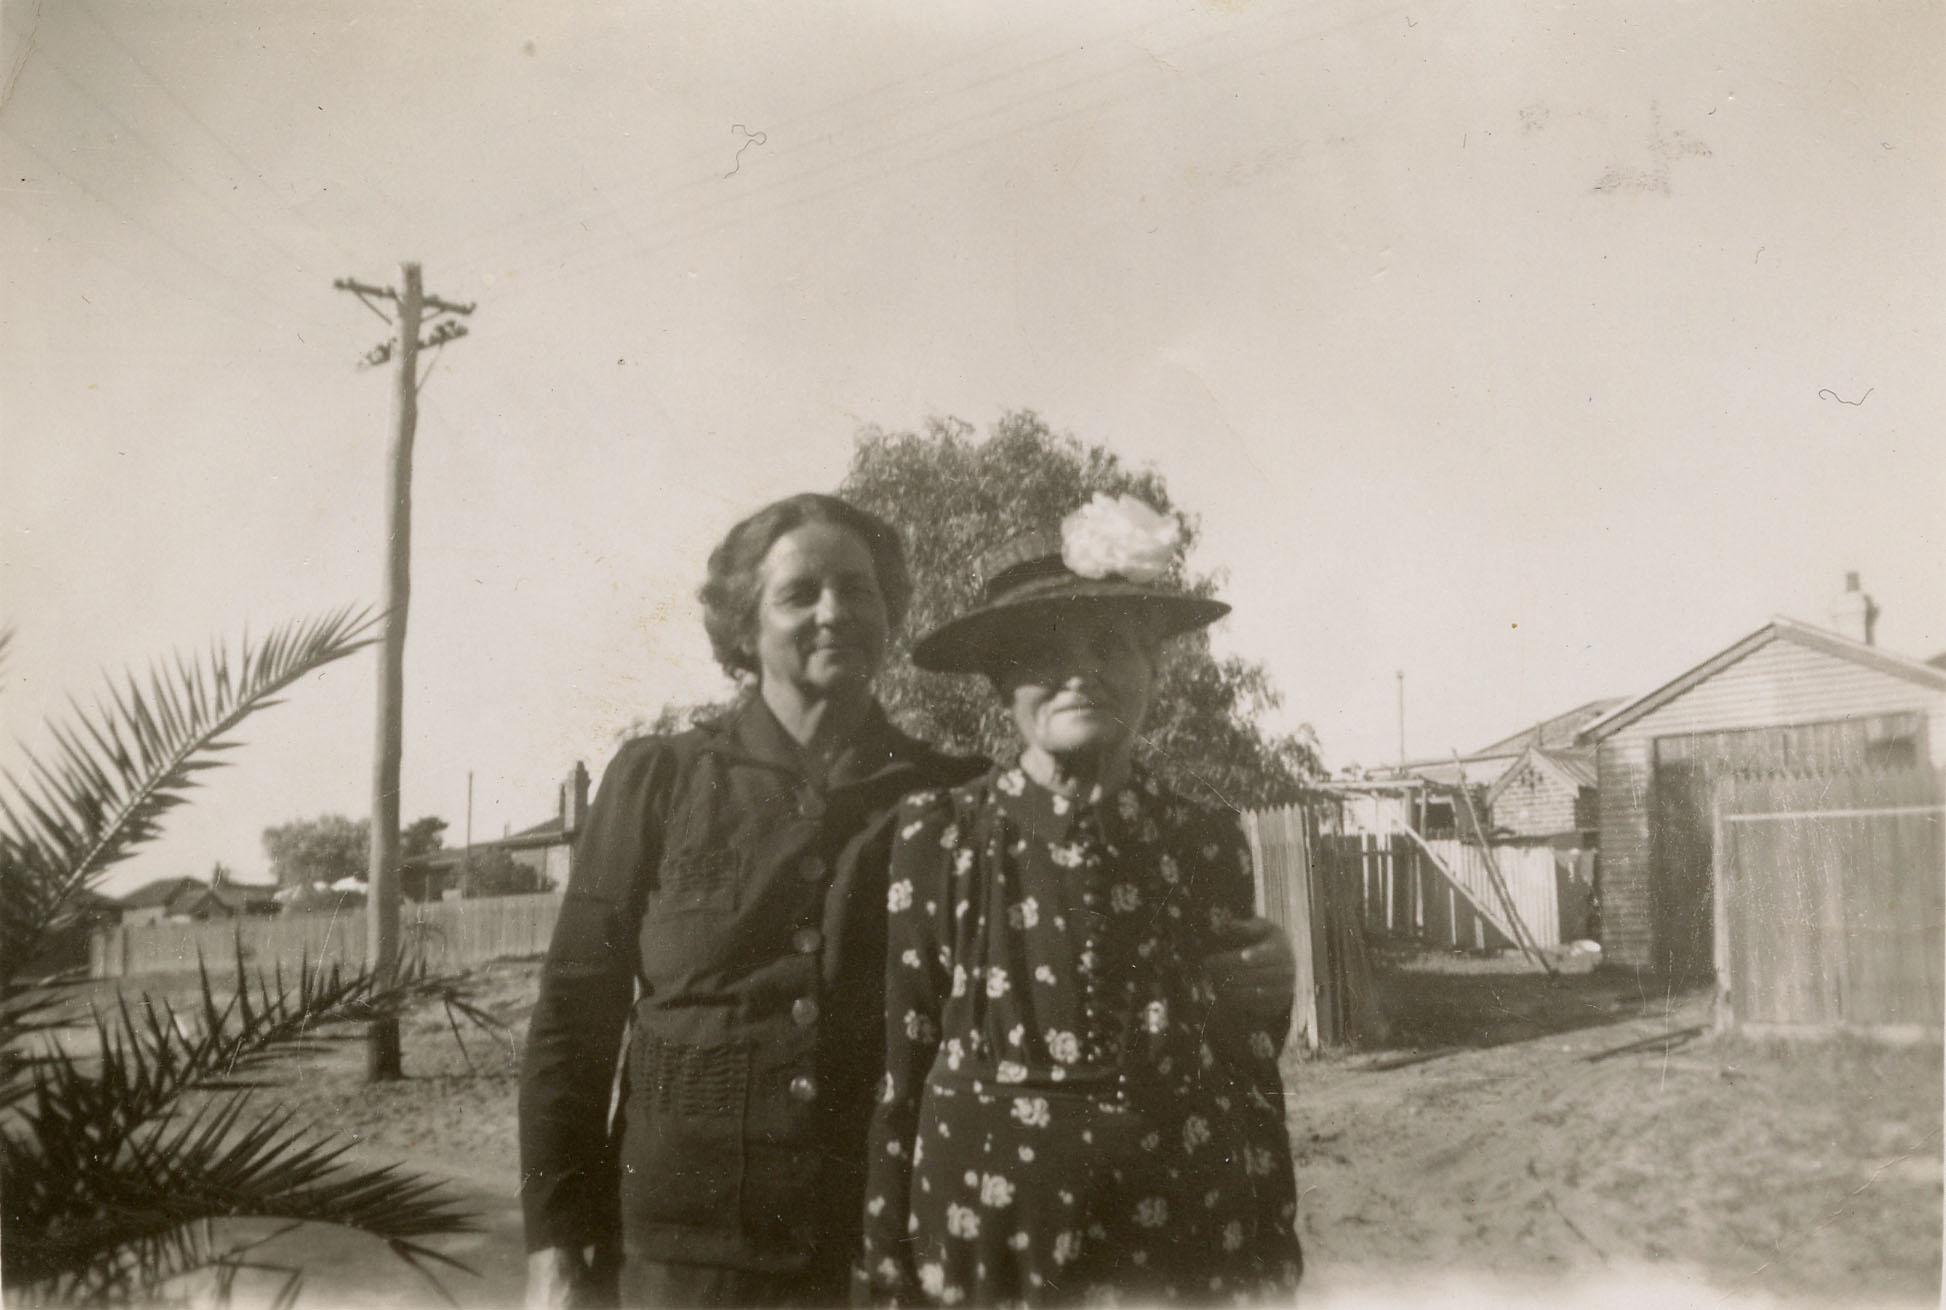 18. Peach Street residents, 1941